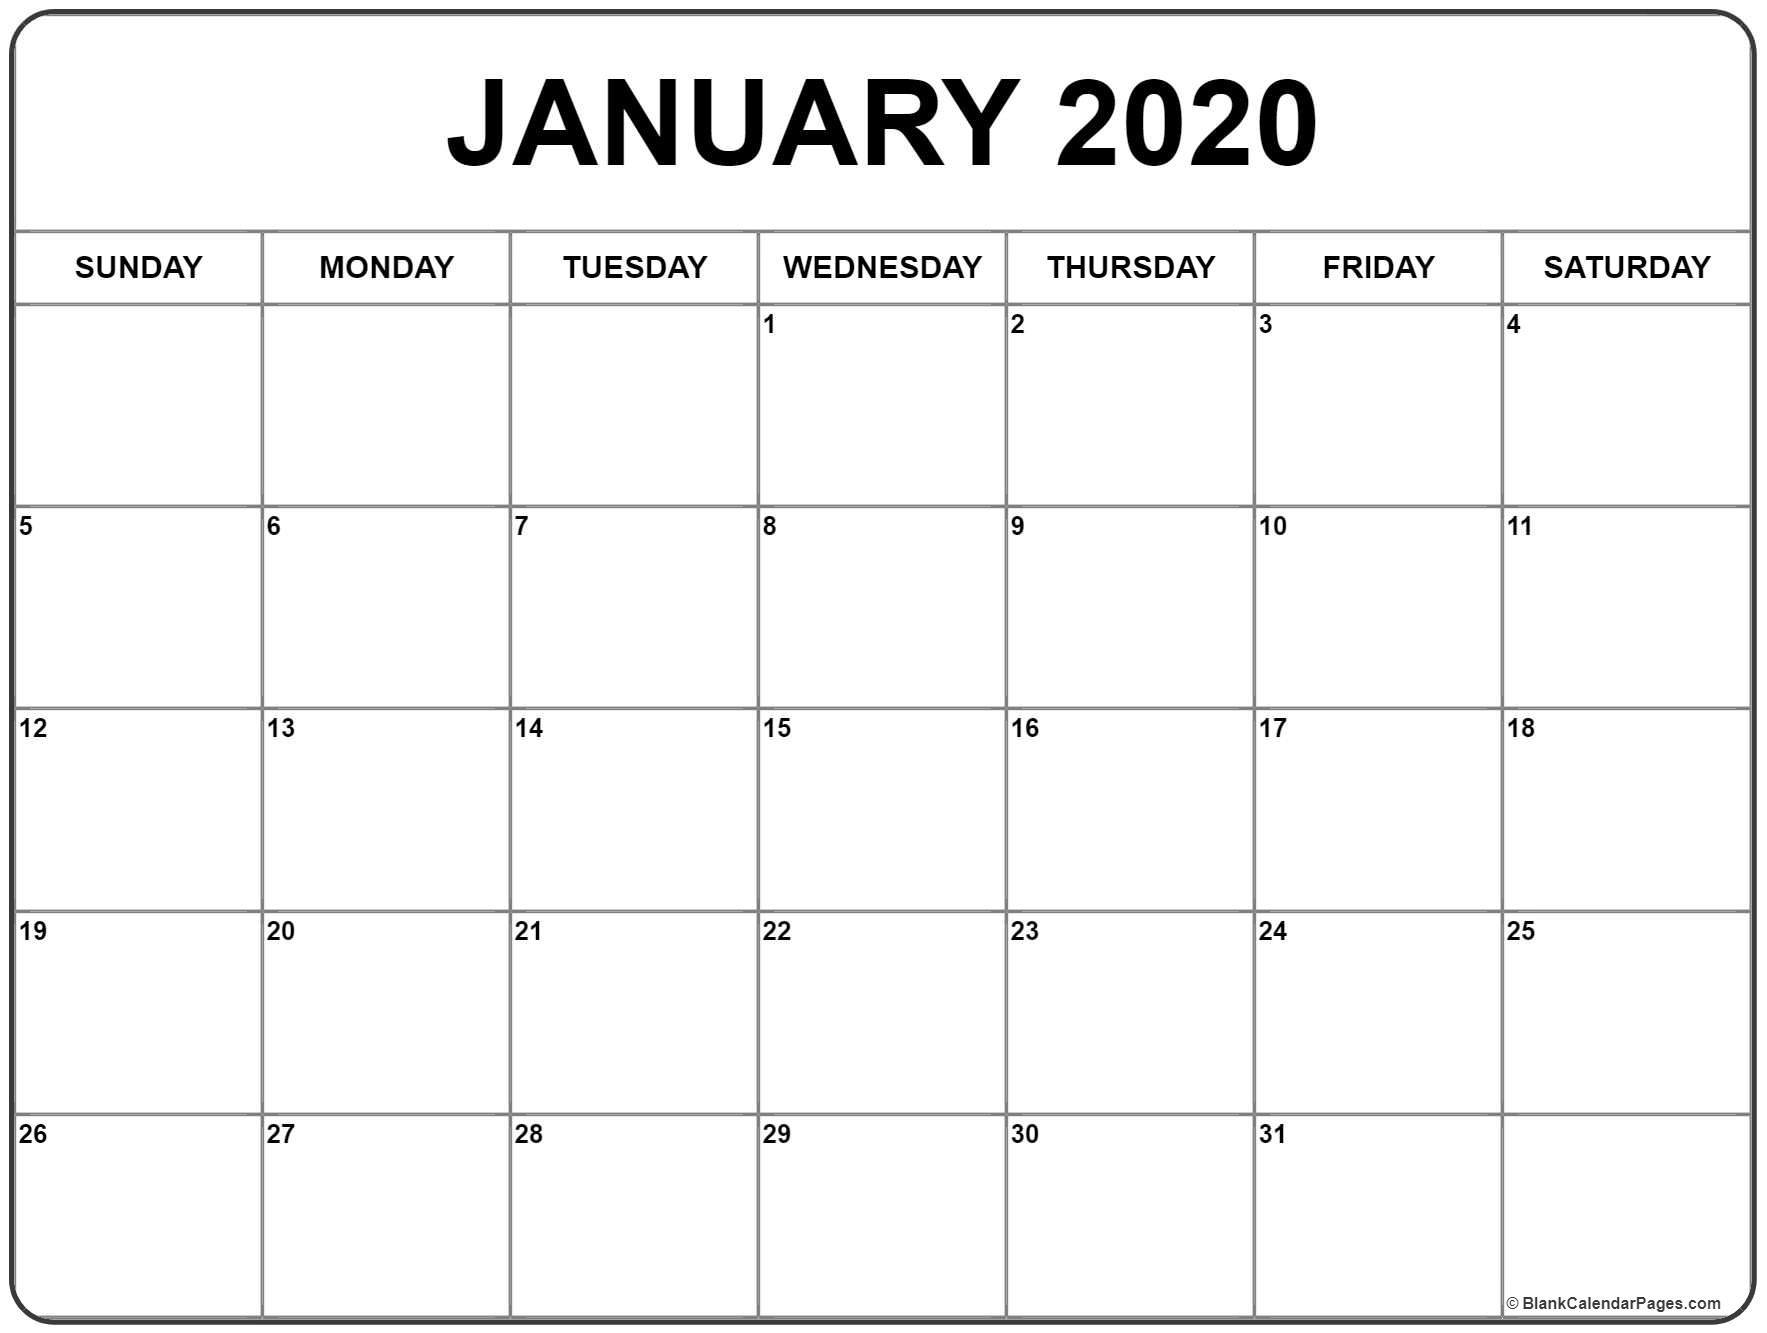 January 2020 Calendar   Free Printable Monthly Calendars In-Las Vegas Calendar January 2020